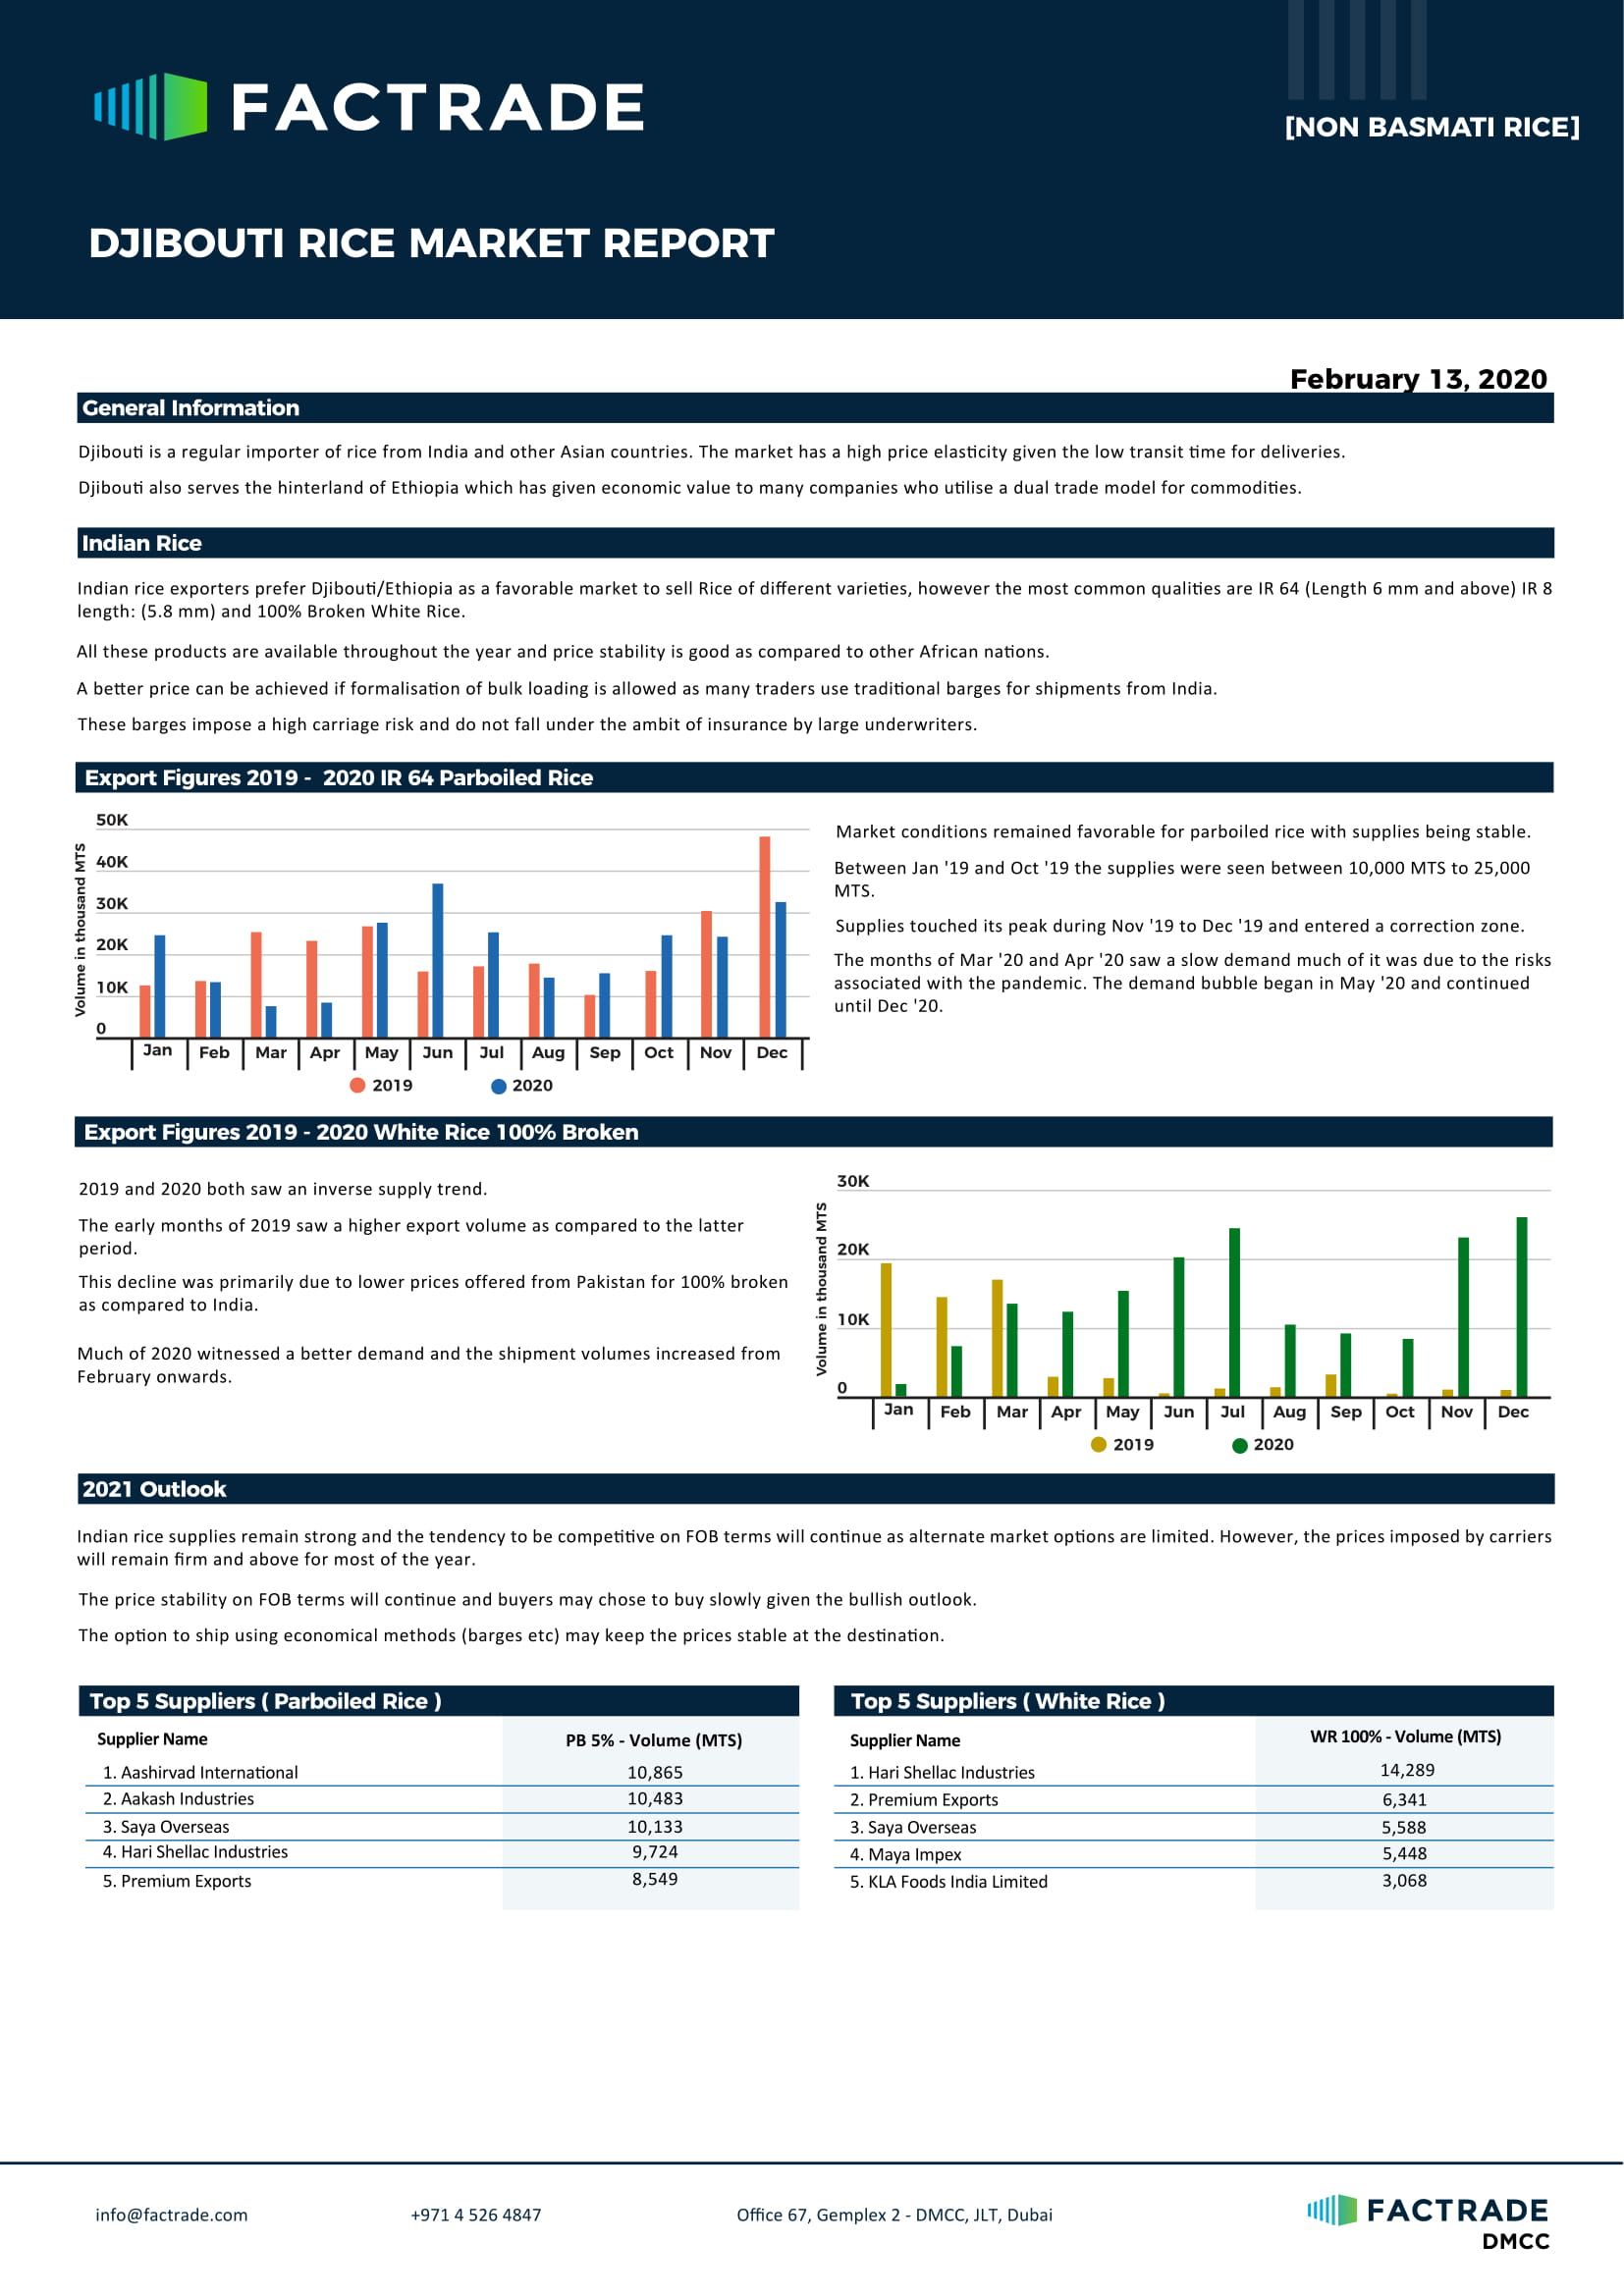 Djibouti rice market report 2021